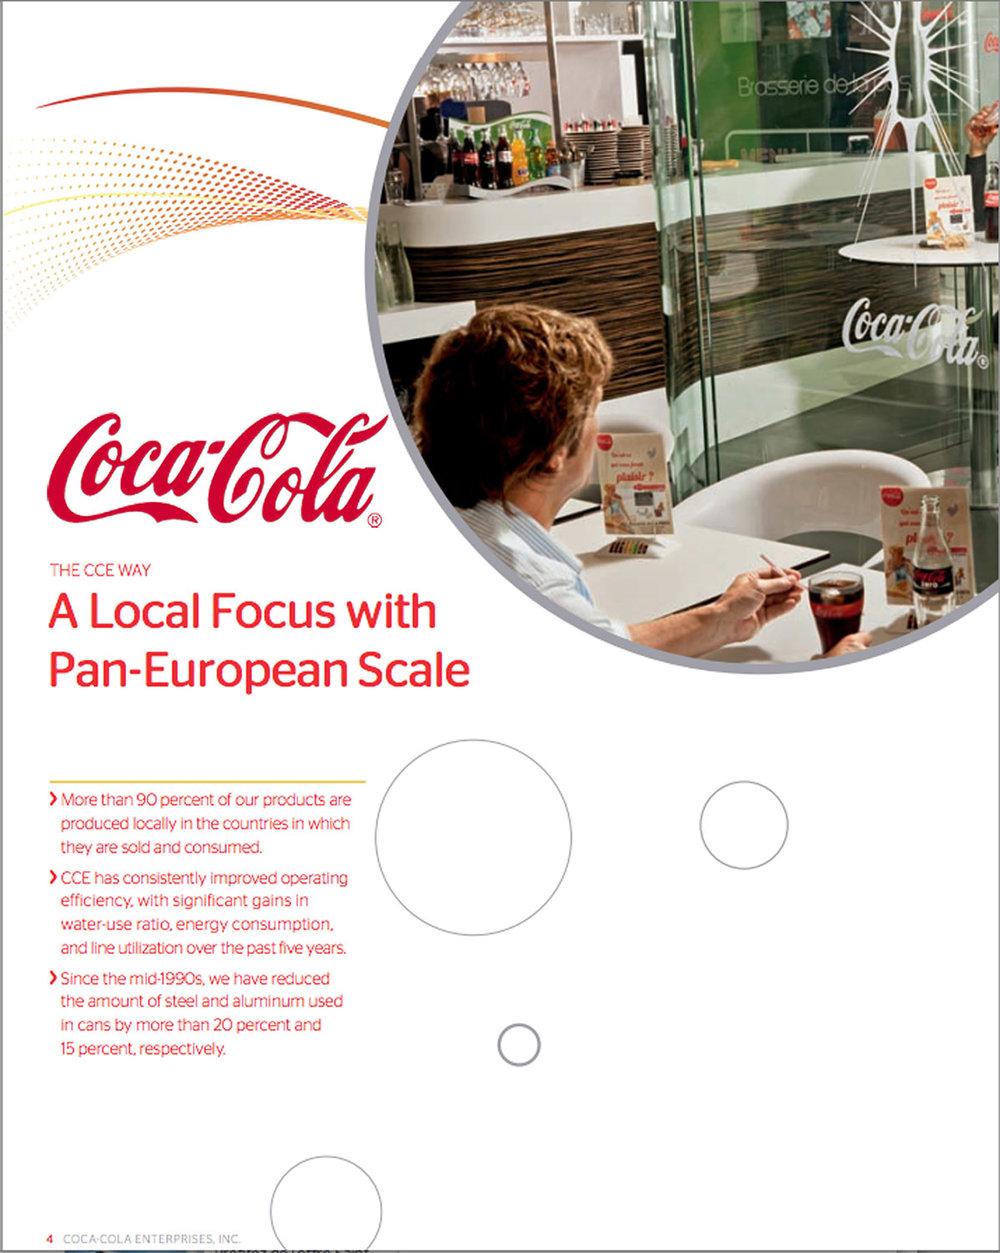 Coca Cola brasserie de la poste07p.jpg